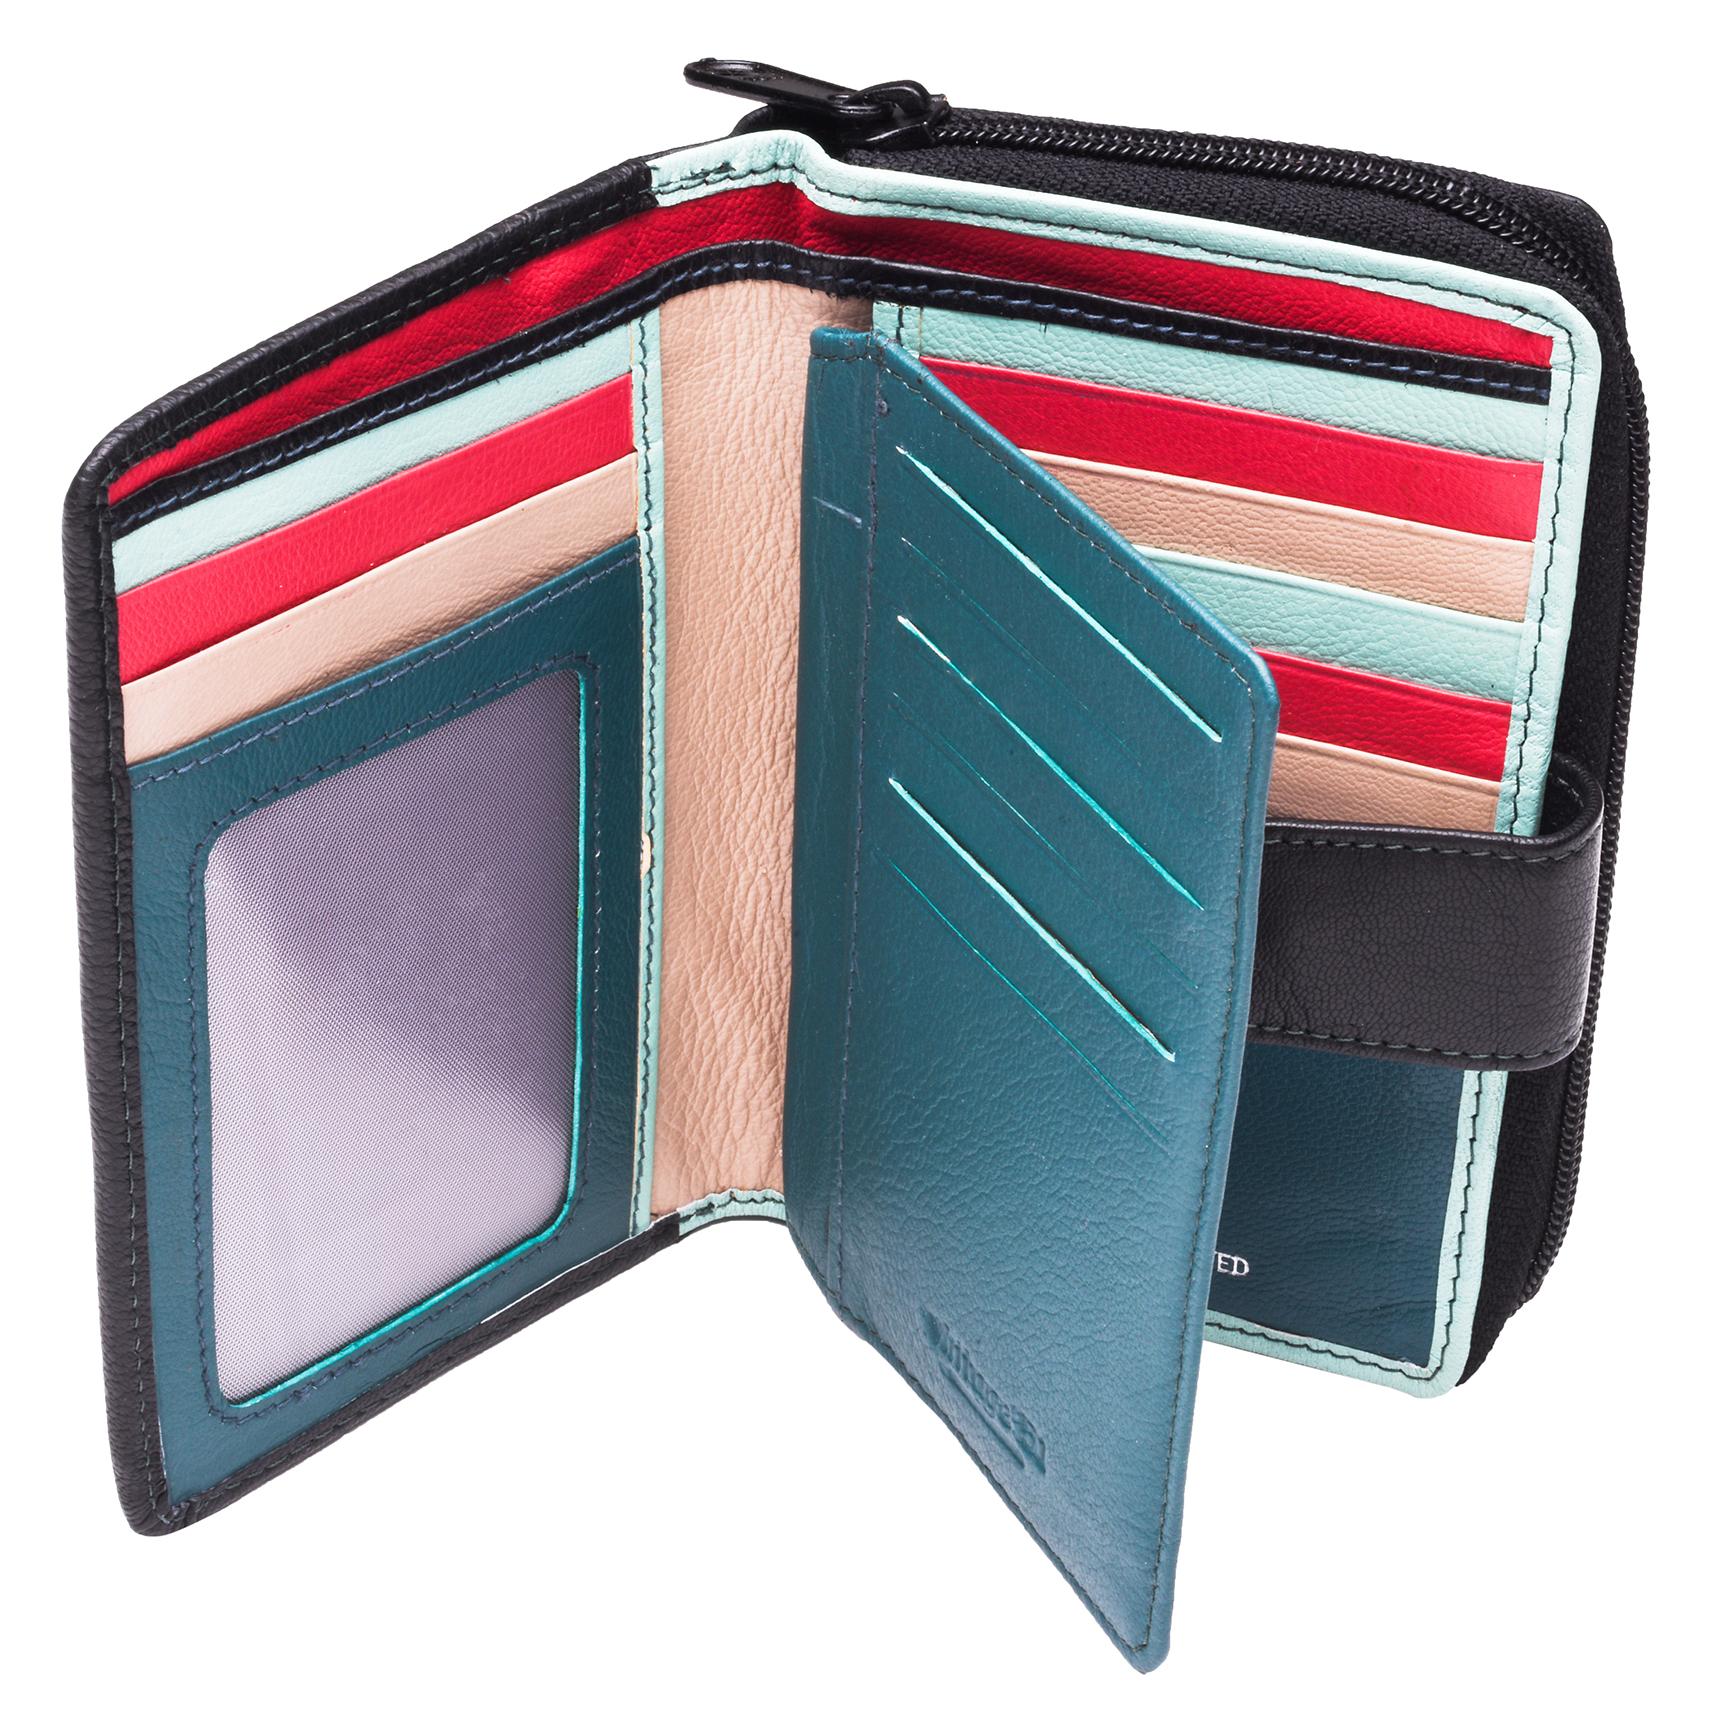 Ladies-Womens-RFID-Blocking-Safe-Leather-Bifold-Medium-Purse-Wallet-Coin-Section thumbnail 20